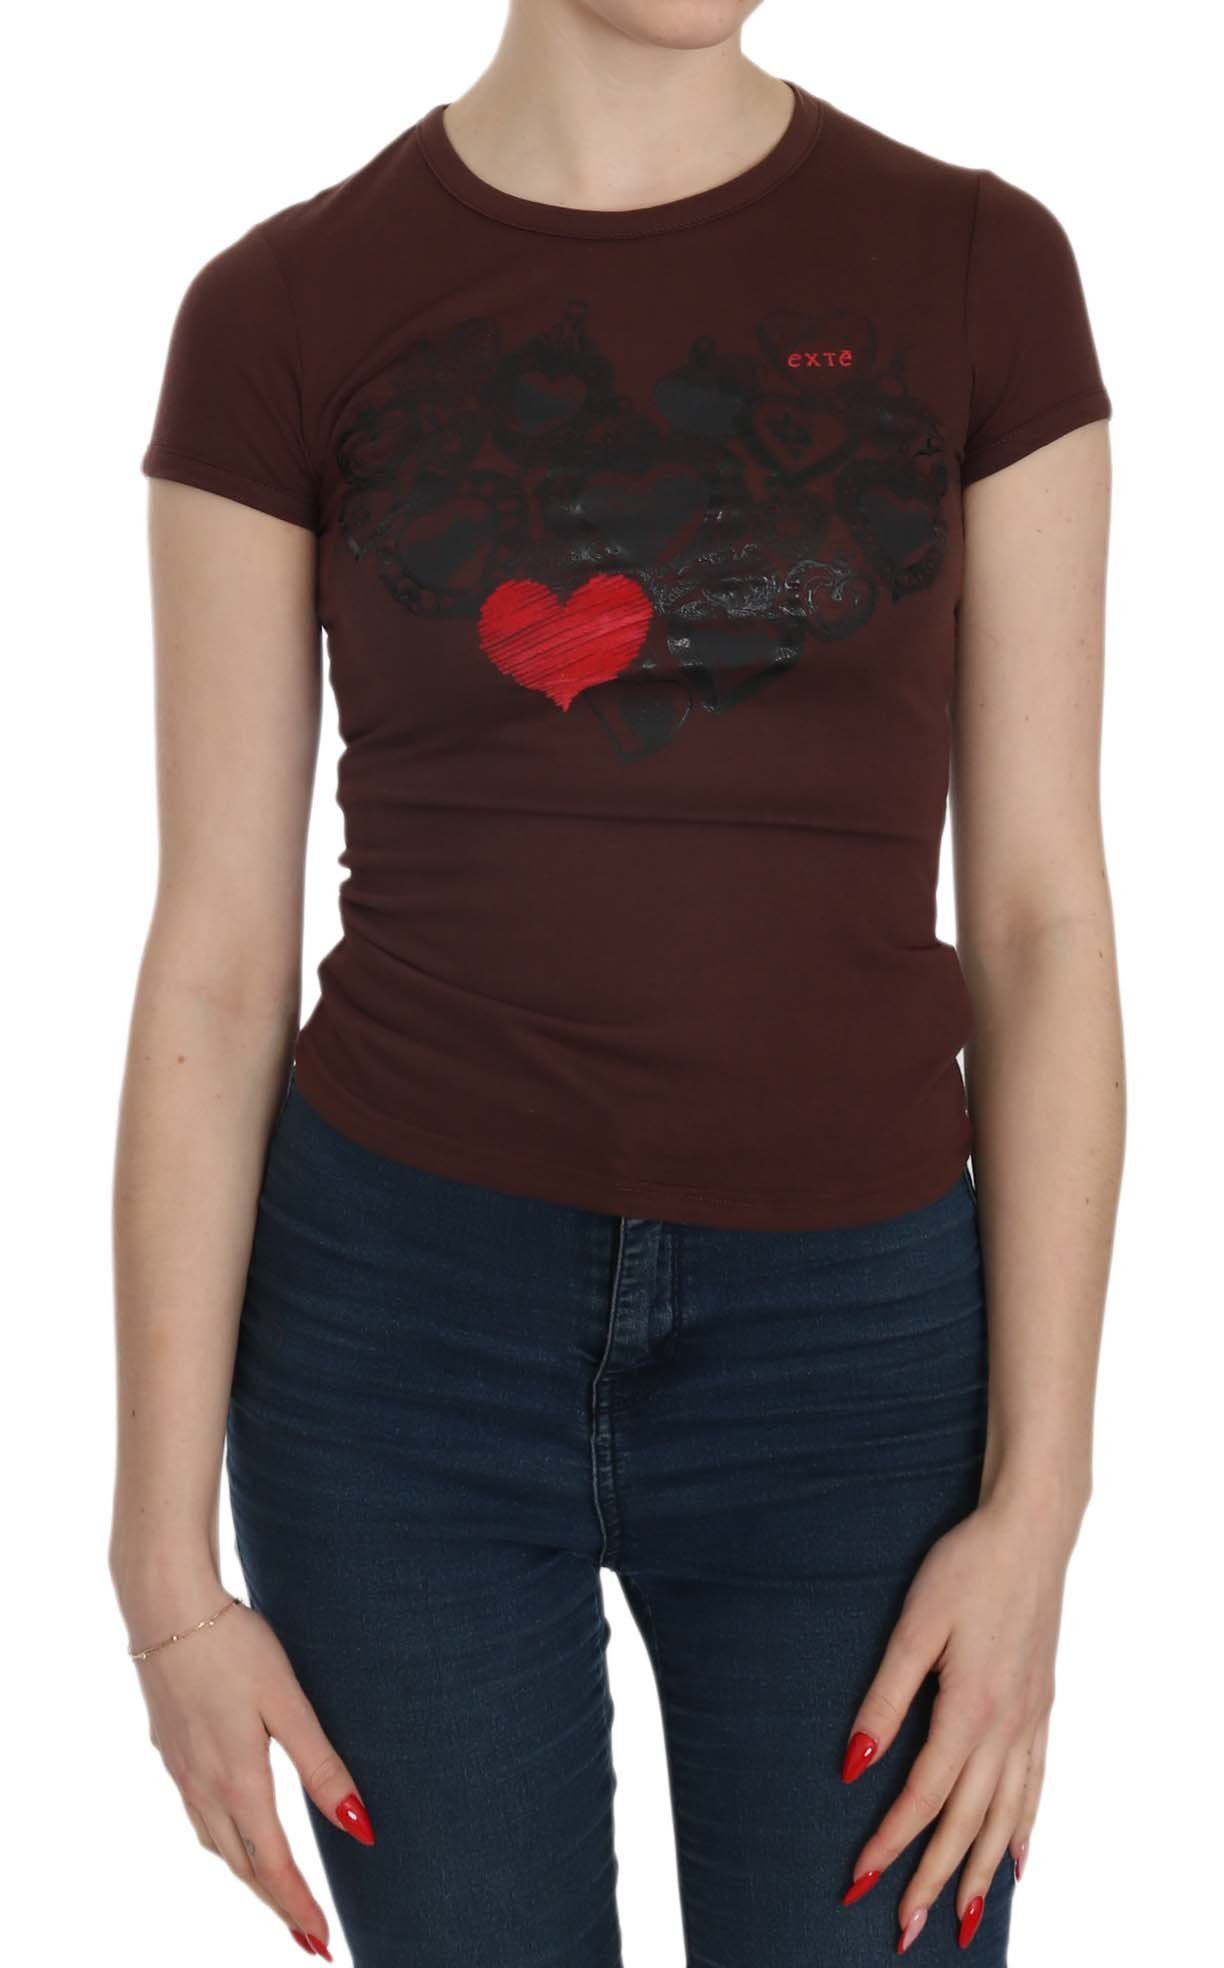 Exte Women's Hearts SS Casual T-shirt Top Brown TSH3909 - IT38 XS